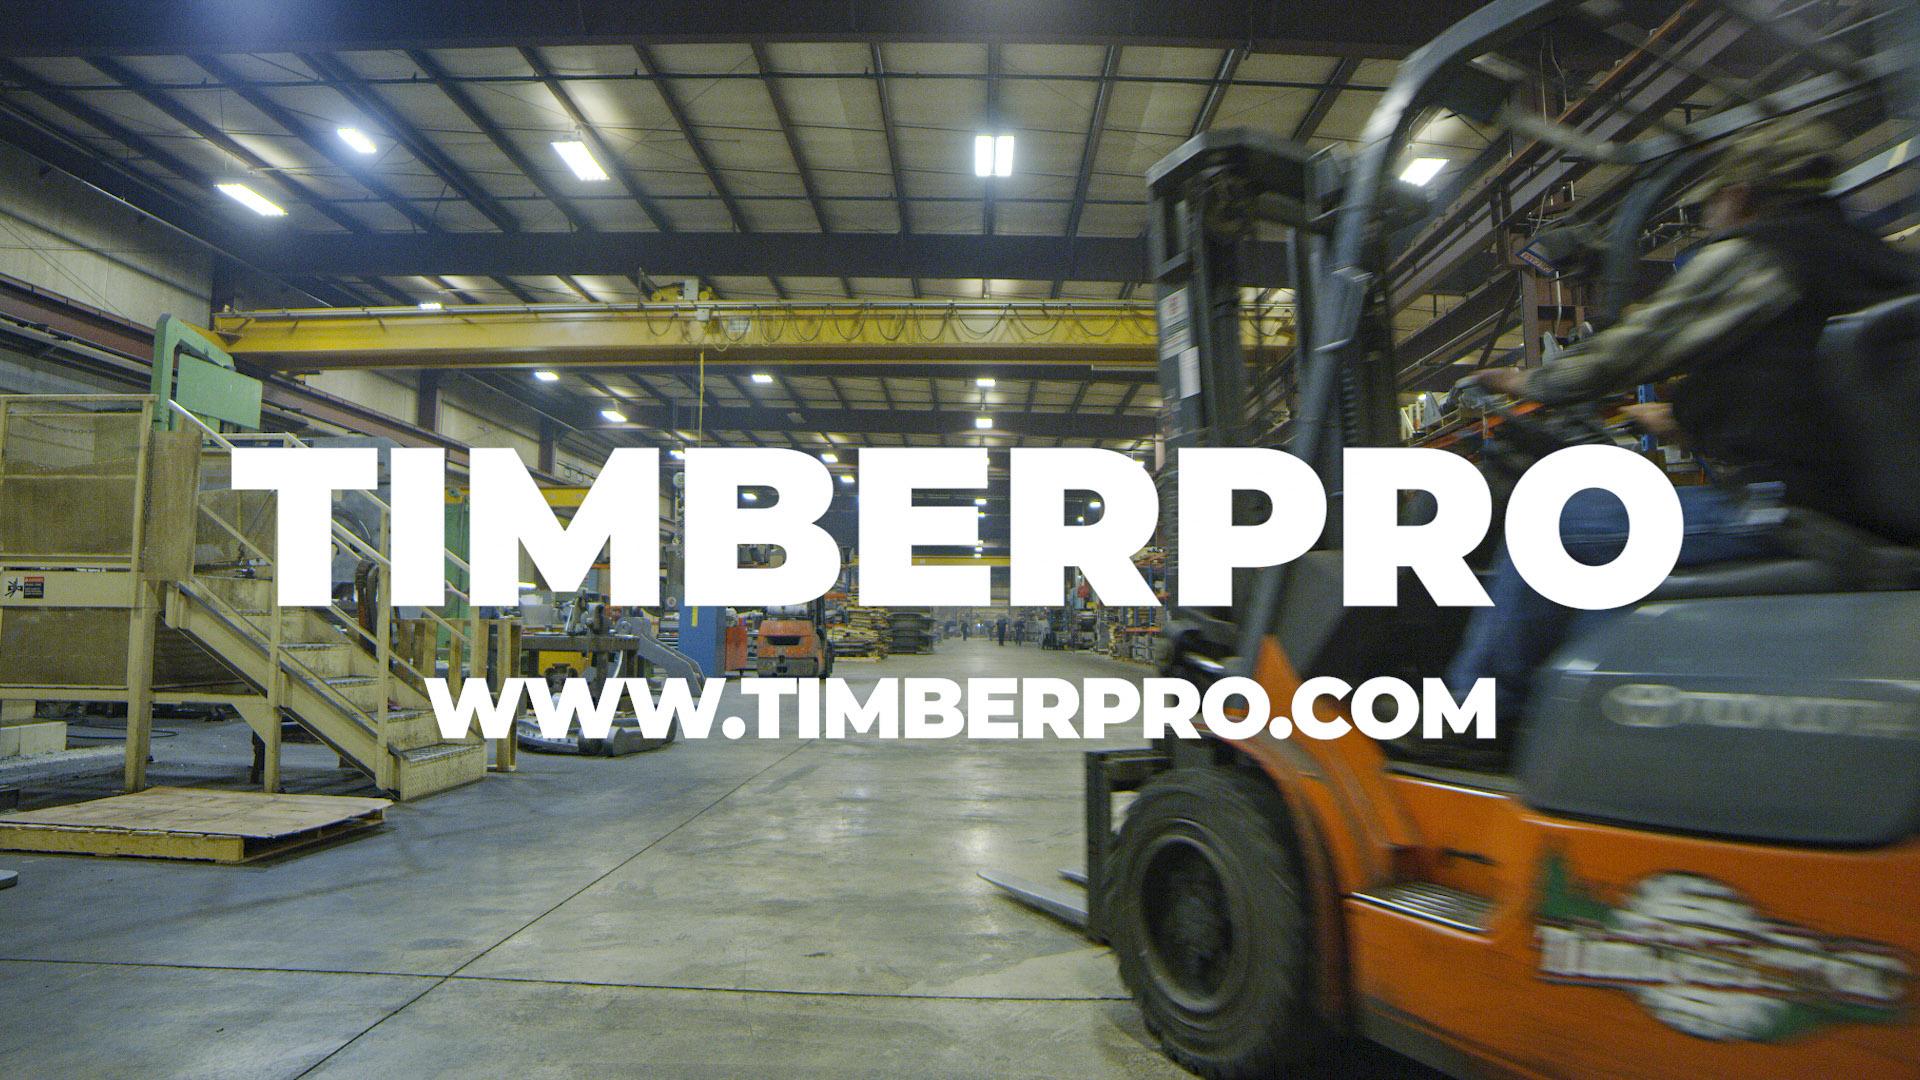 Timberpro Factory Promo